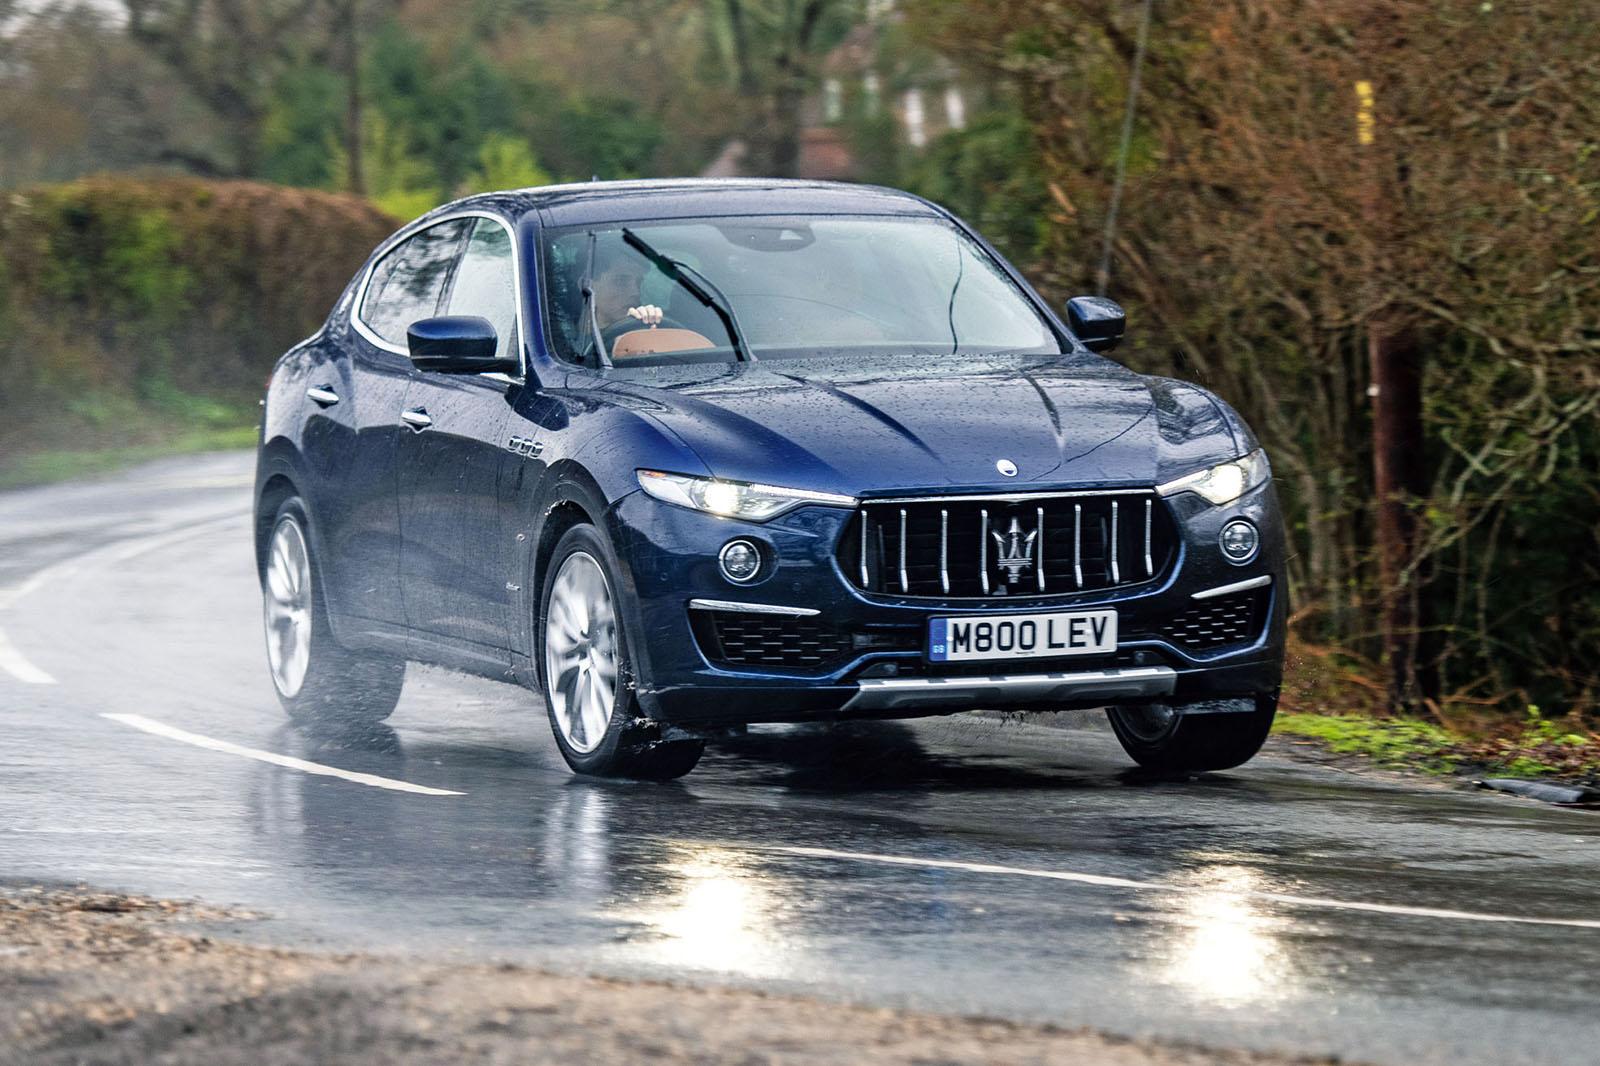 Maserati Levante Ride Handling Autocar